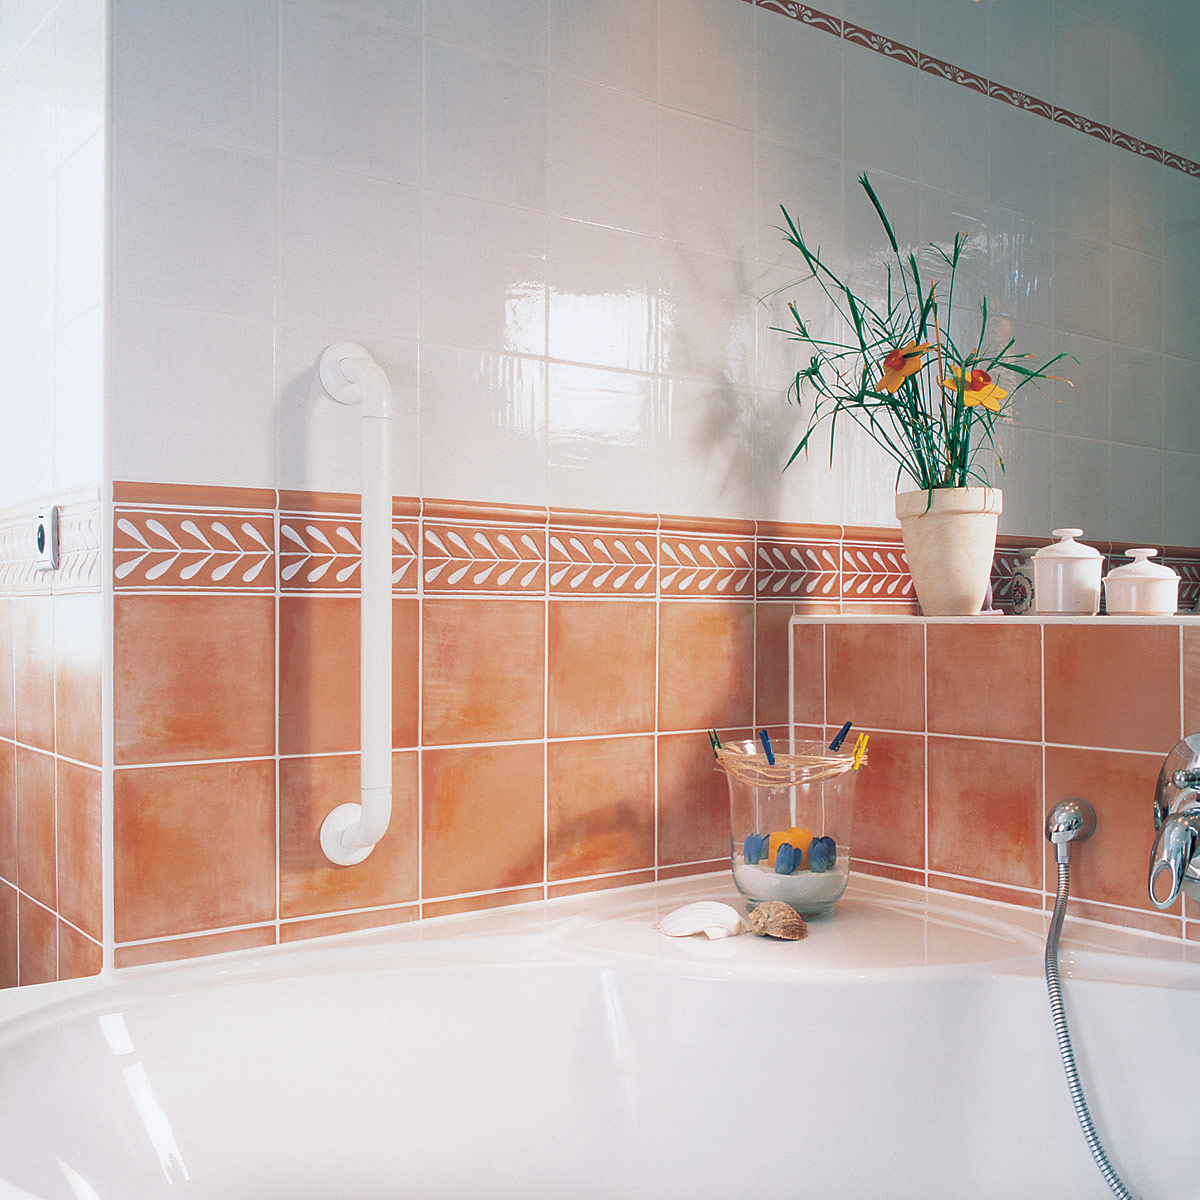 Bathroom safety grab bars - Grab bars for toilet in bathrooms ...